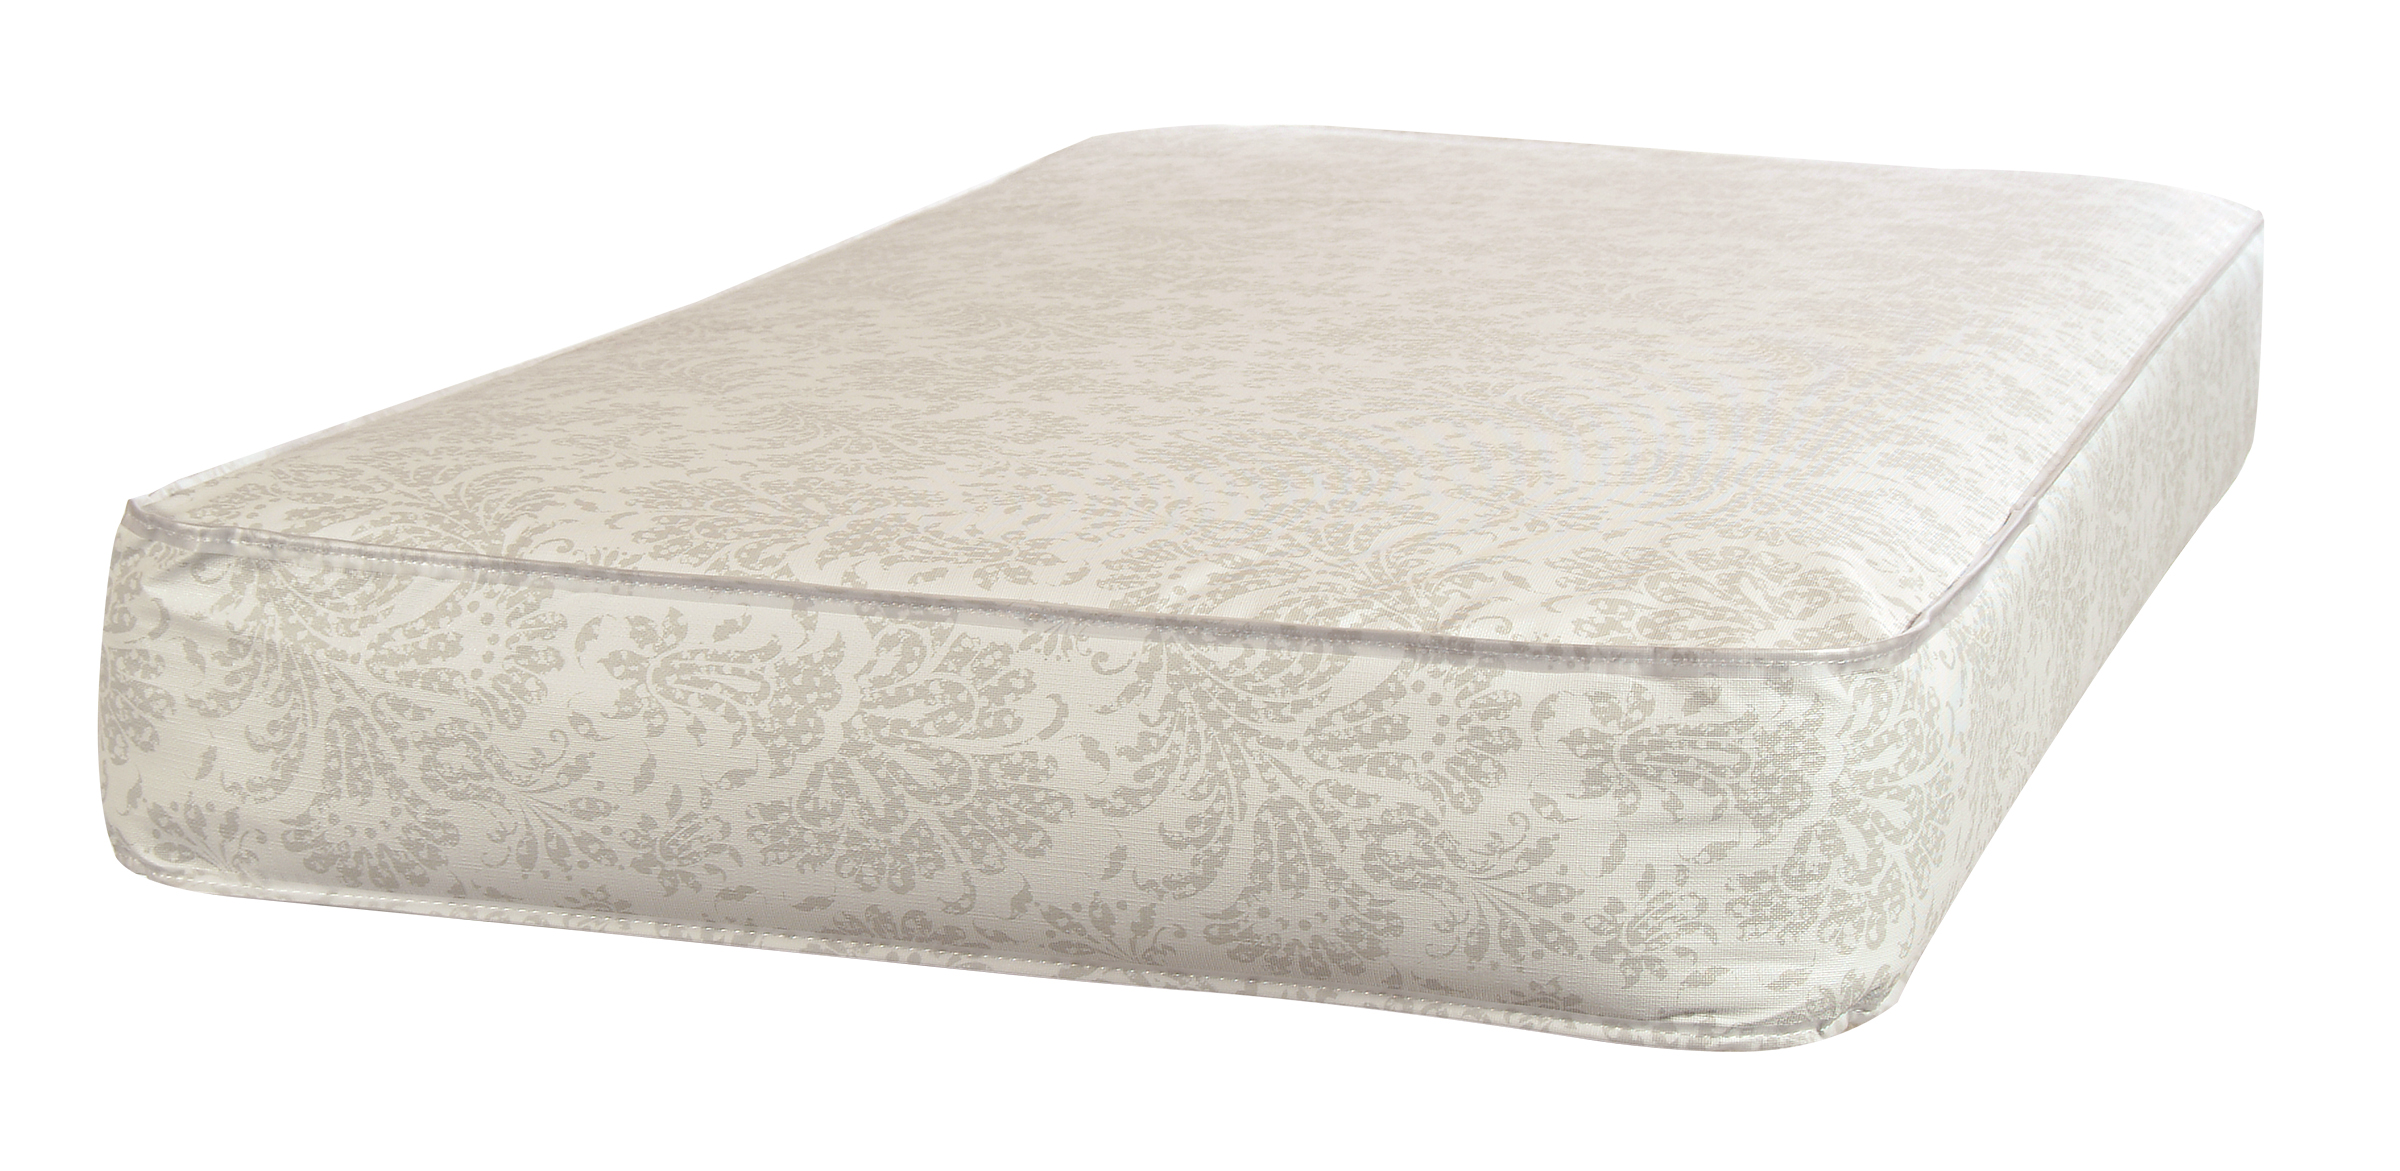 Baby crib mattress amazon - Baby Crib Mattress Amazon 3